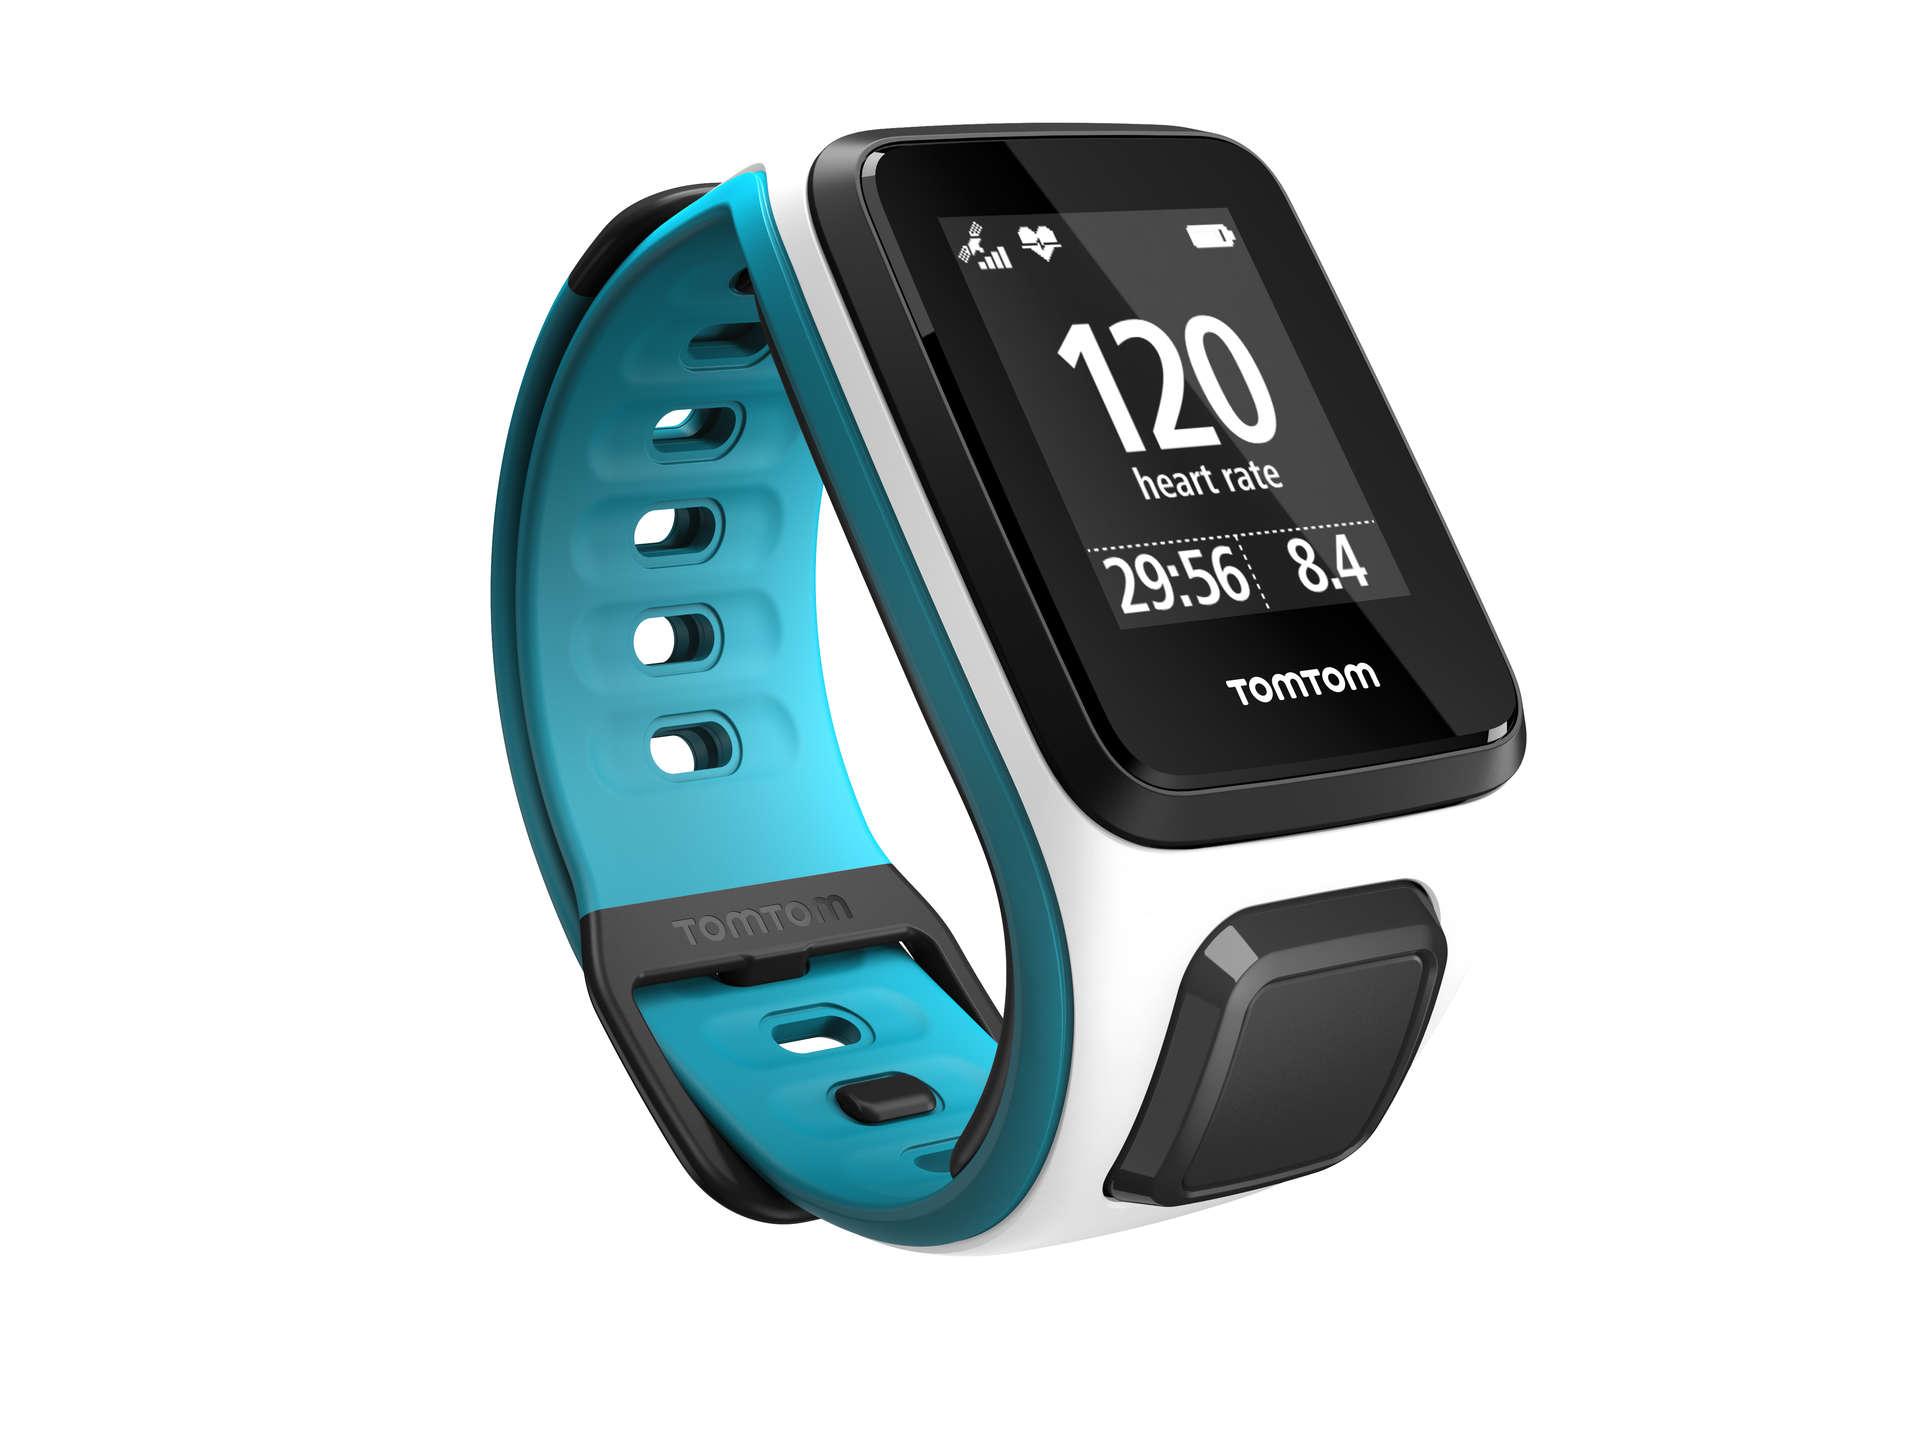 Runner 2 Cardio GPS horloge WitBlauw